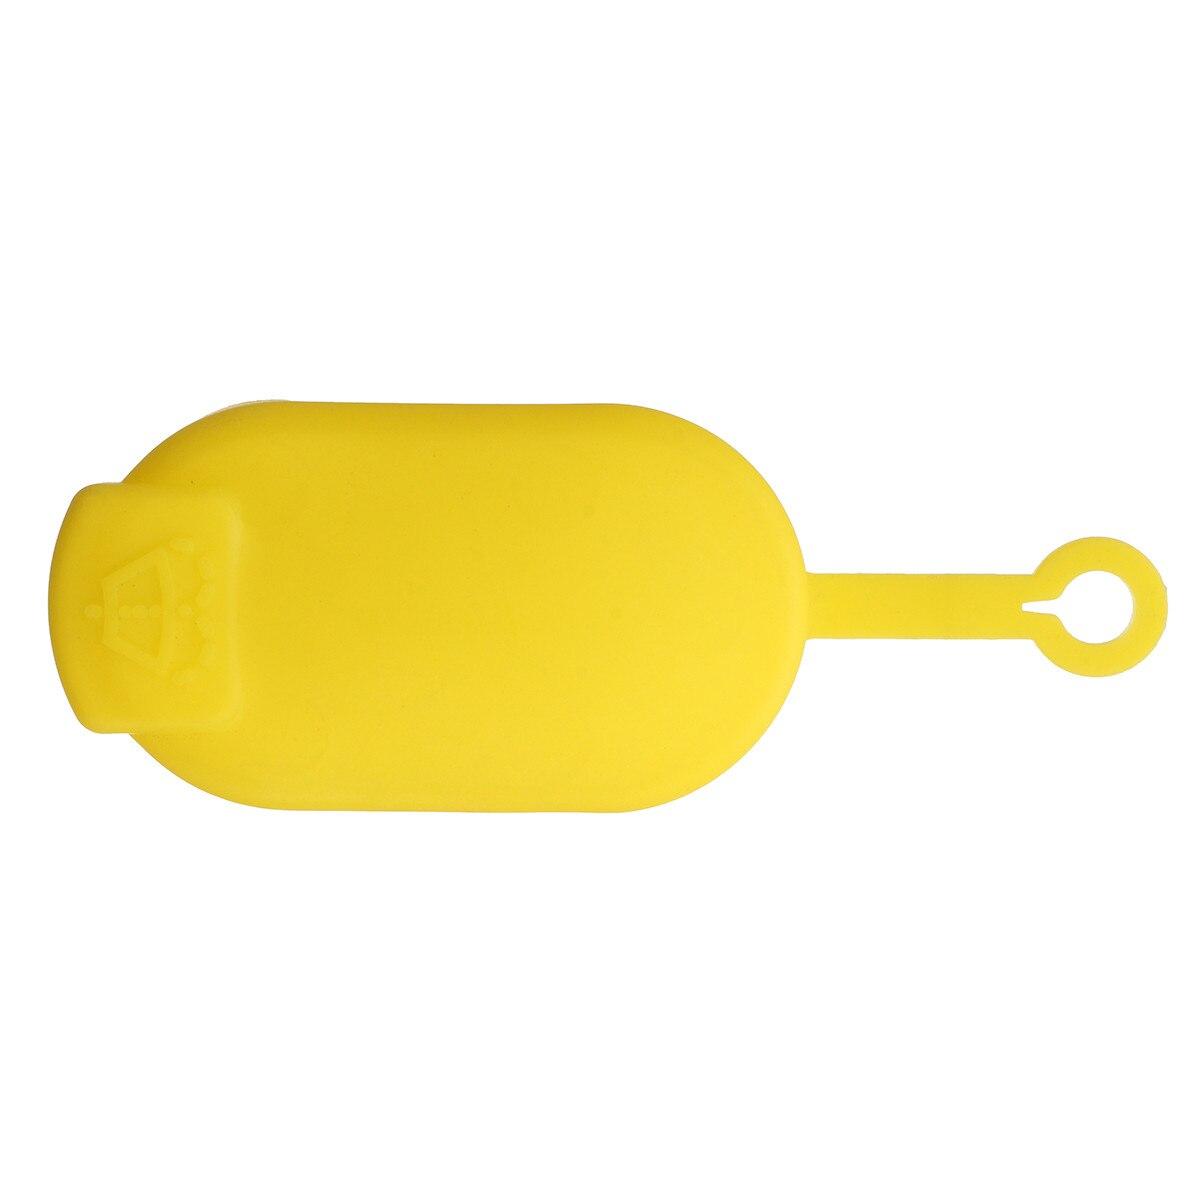 Car Washer Bottle Cap For Renault Clio Lagnua Megane Scenic Espace Kangoo 7700411279